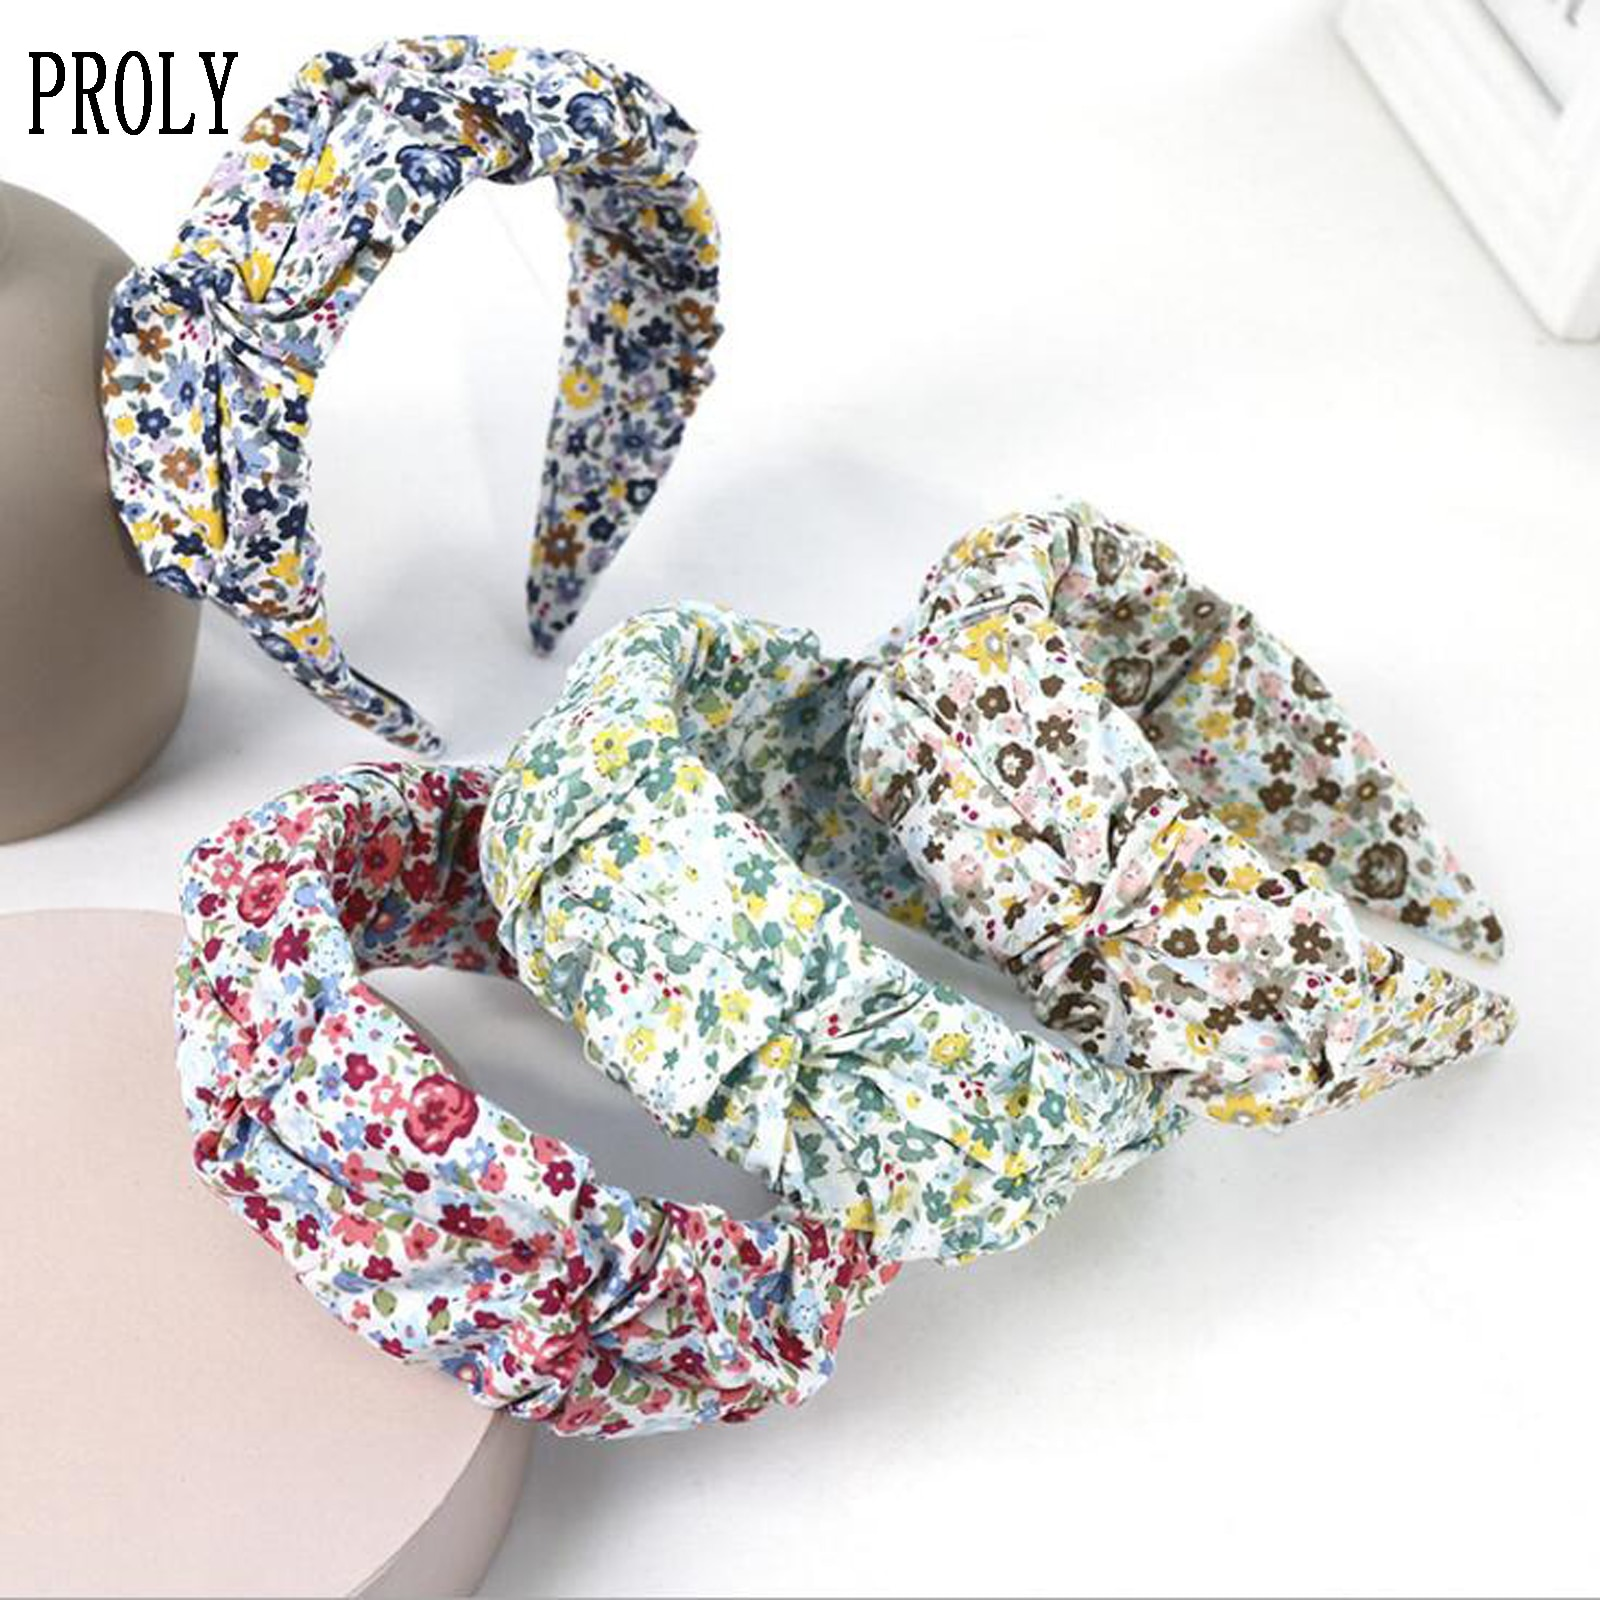 PROLY, nueva diadema de moda para mujeres, pequeña diadema Floral fresca, diadema de flores Lado ancho, turbante suave, accesorios para el cabello para adultos